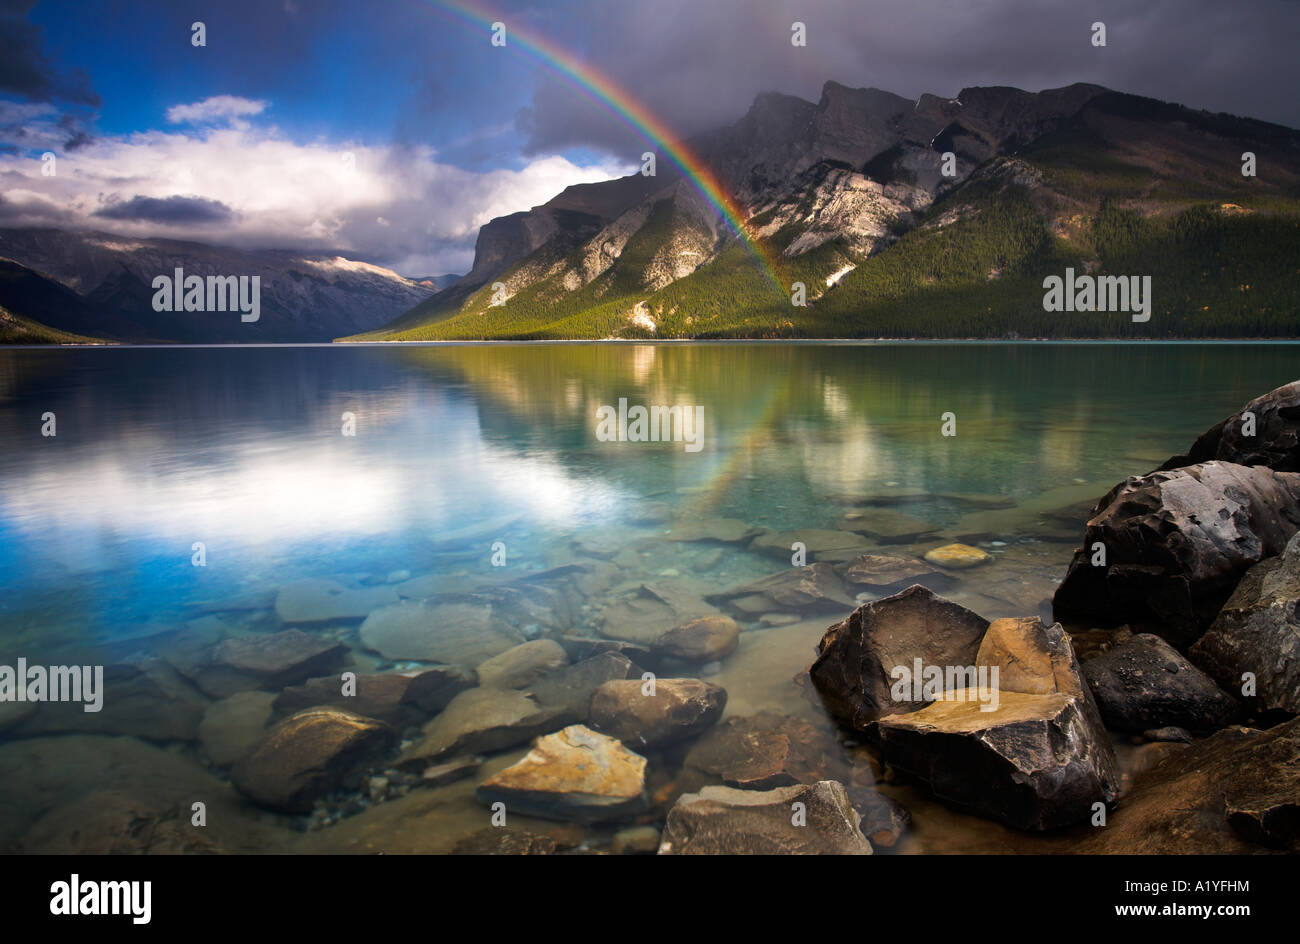 Arco iris sobre el Lago Minnewanka, Parque Nacional de Banff, Alberta, Canadá Imagen De Stock